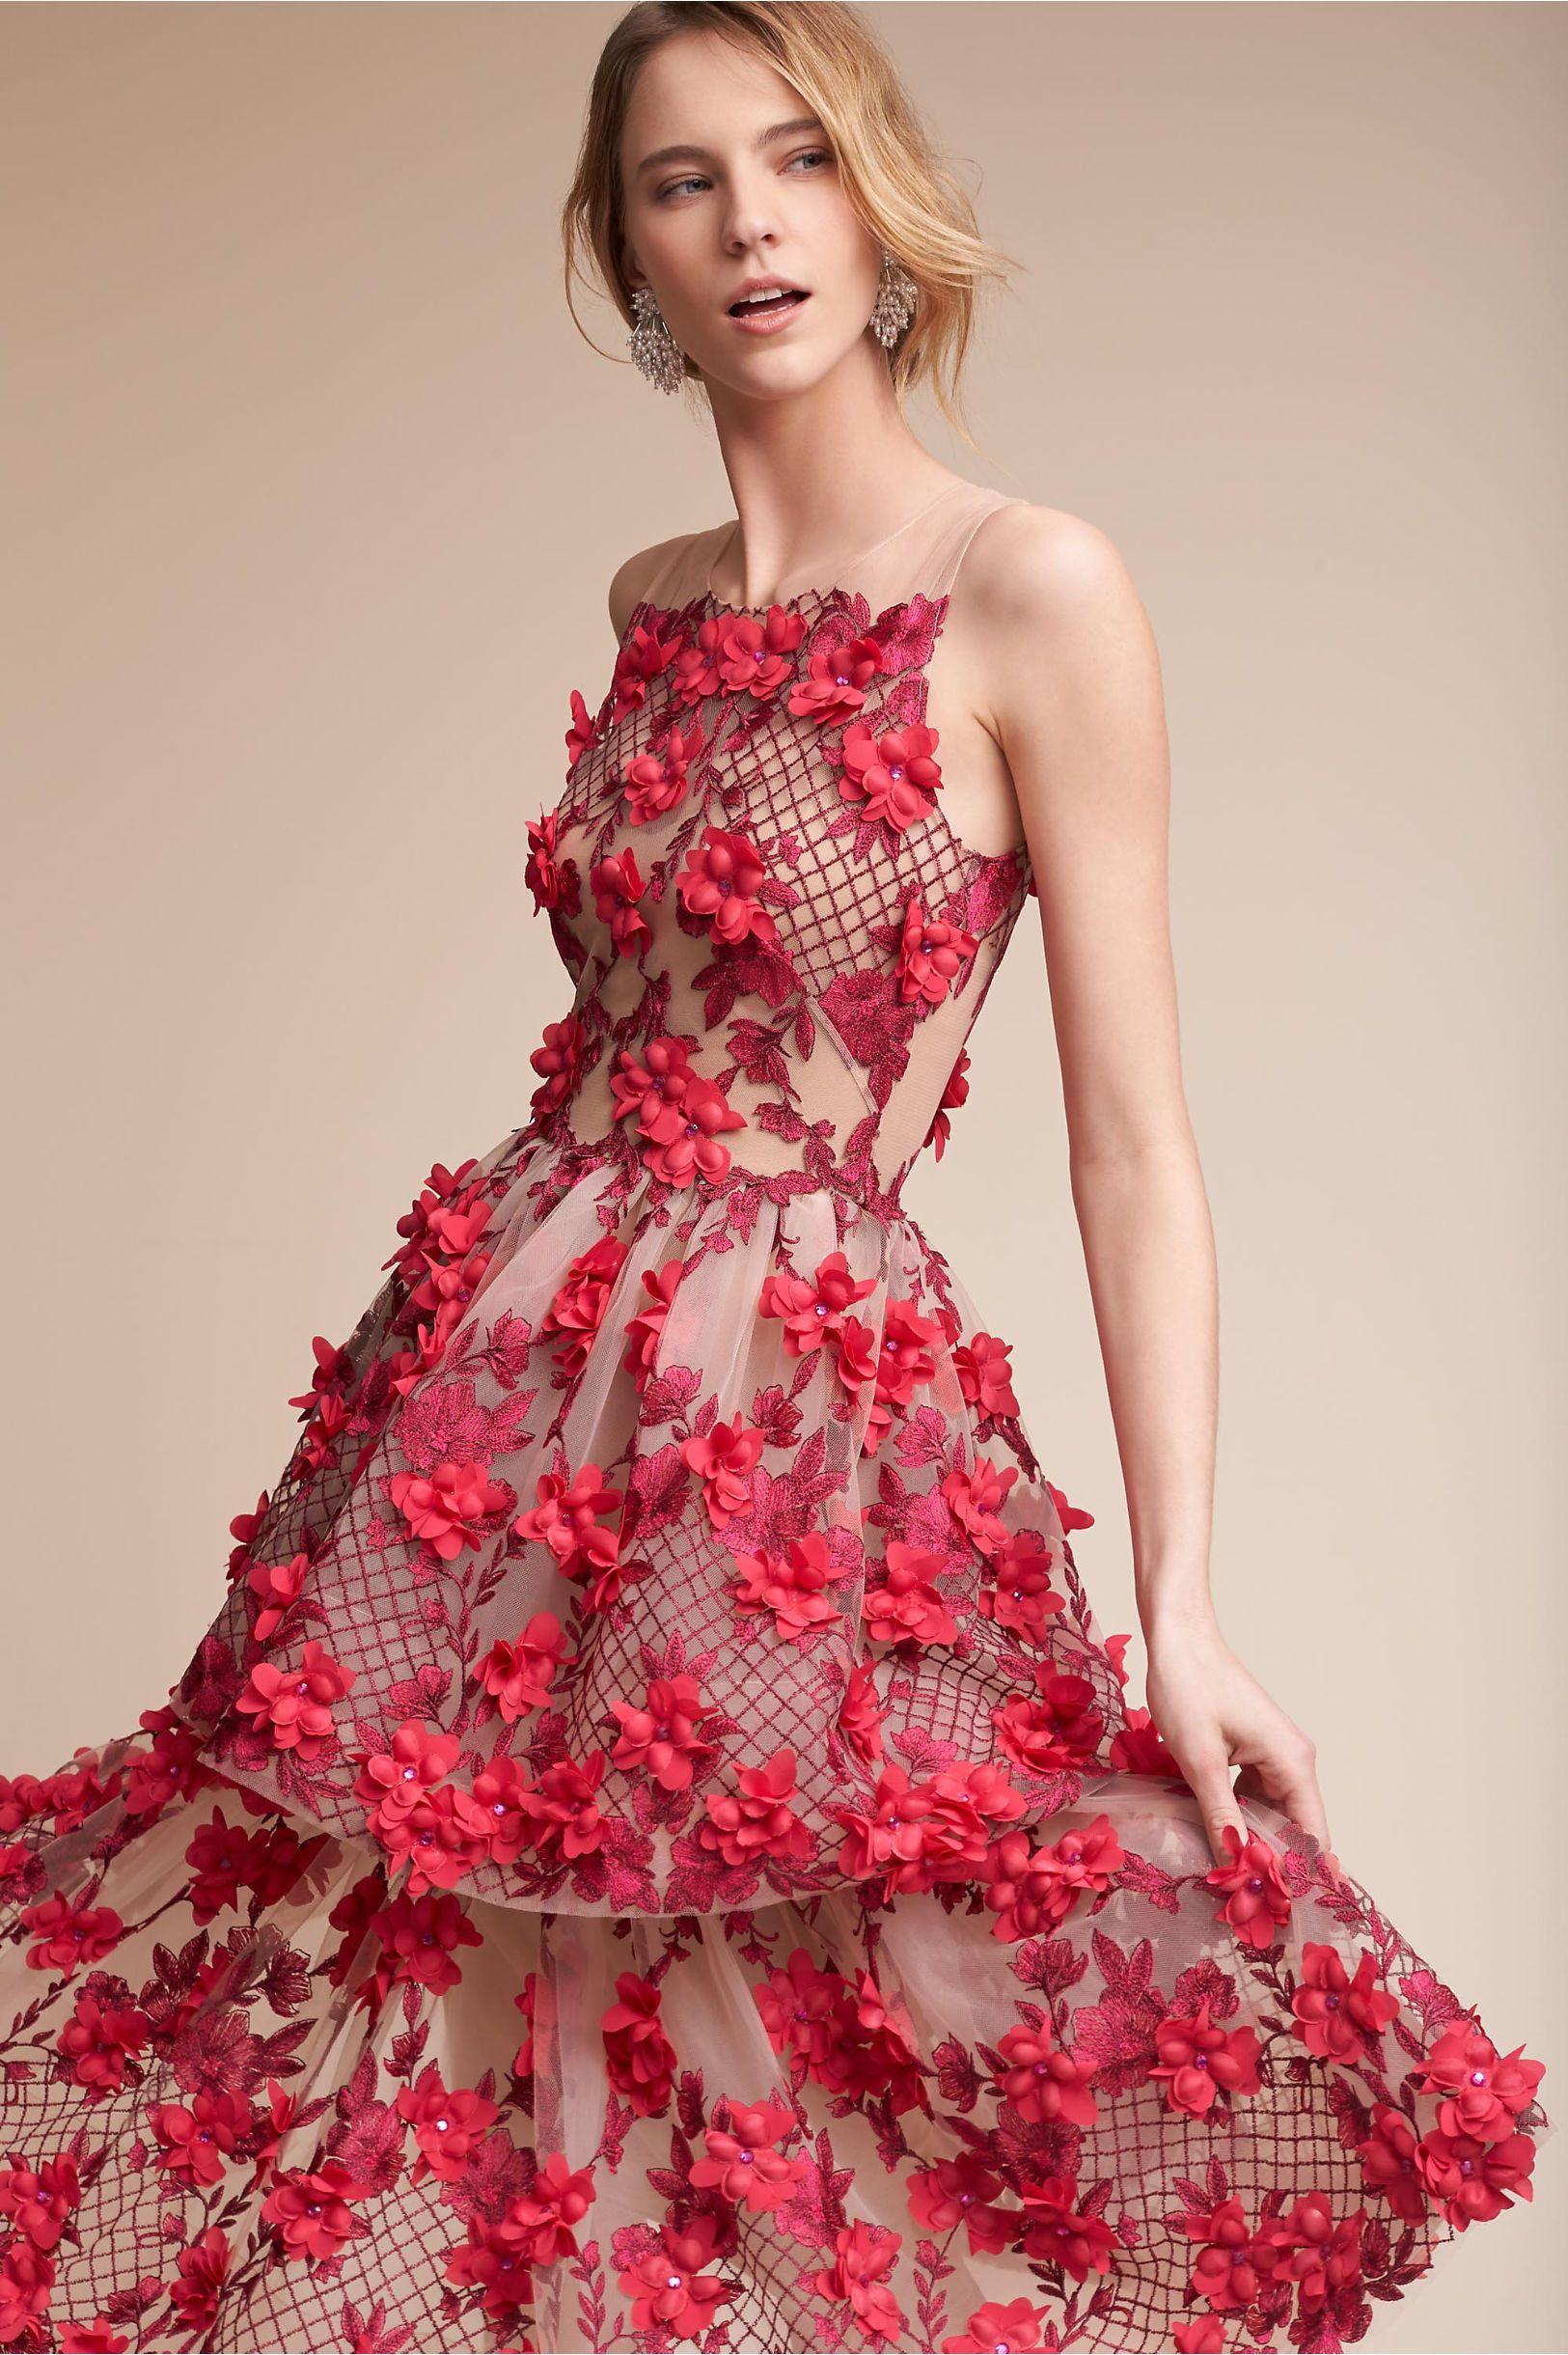 Cece wedding dress  BHLDN Cece Dress in Occasion Dresses View All Dresses  BHLDN  wear